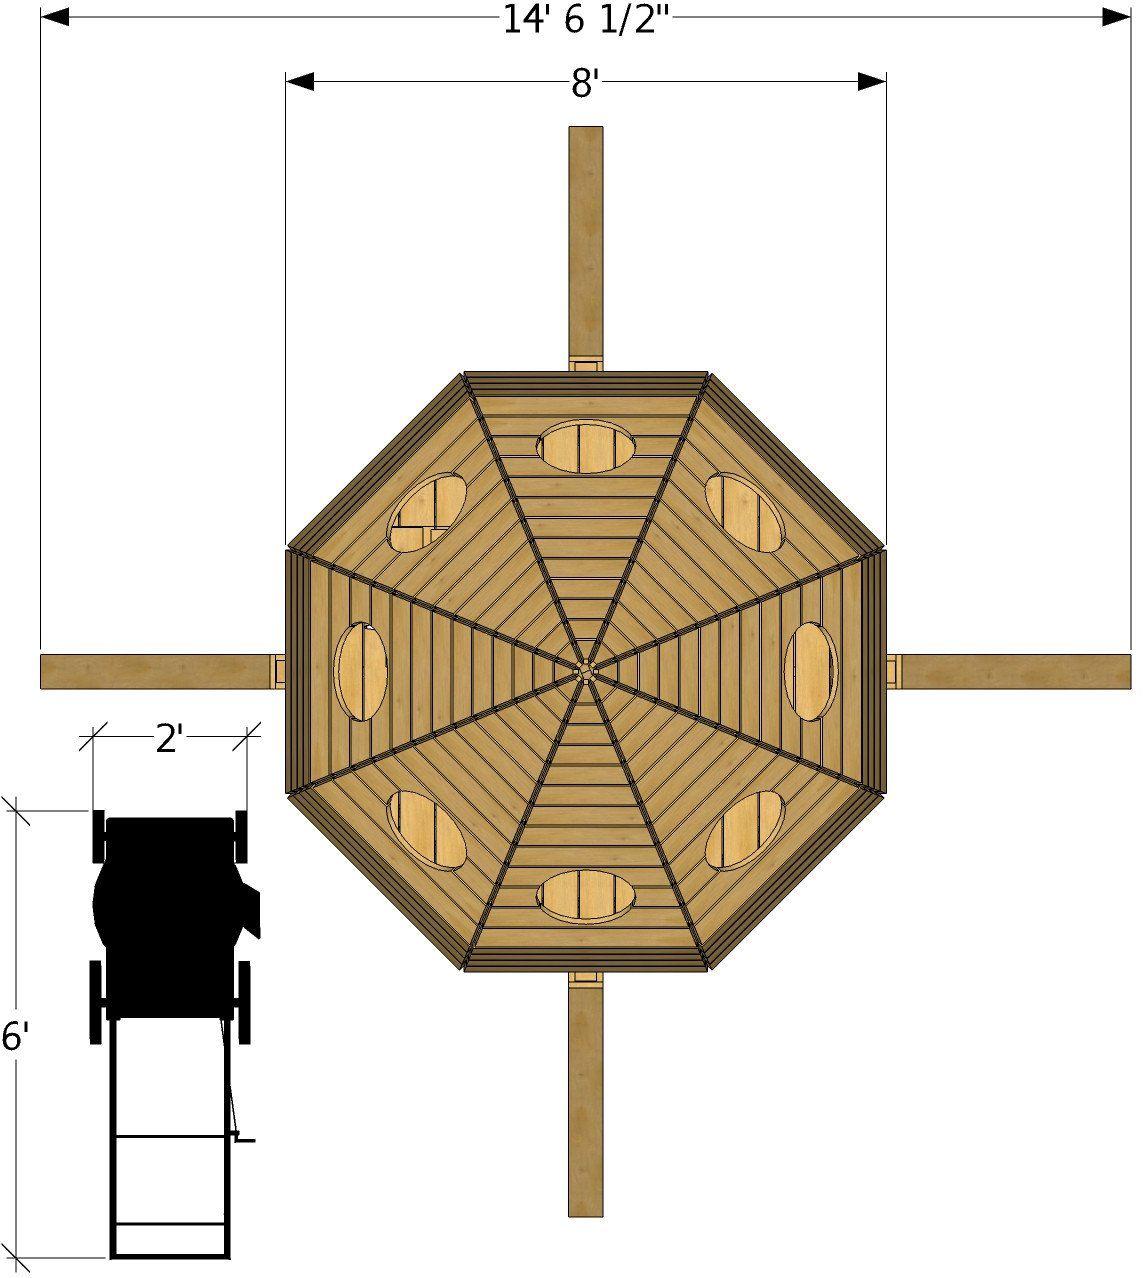 Top Isometric View Of Rocket Ship Playhouse Plan